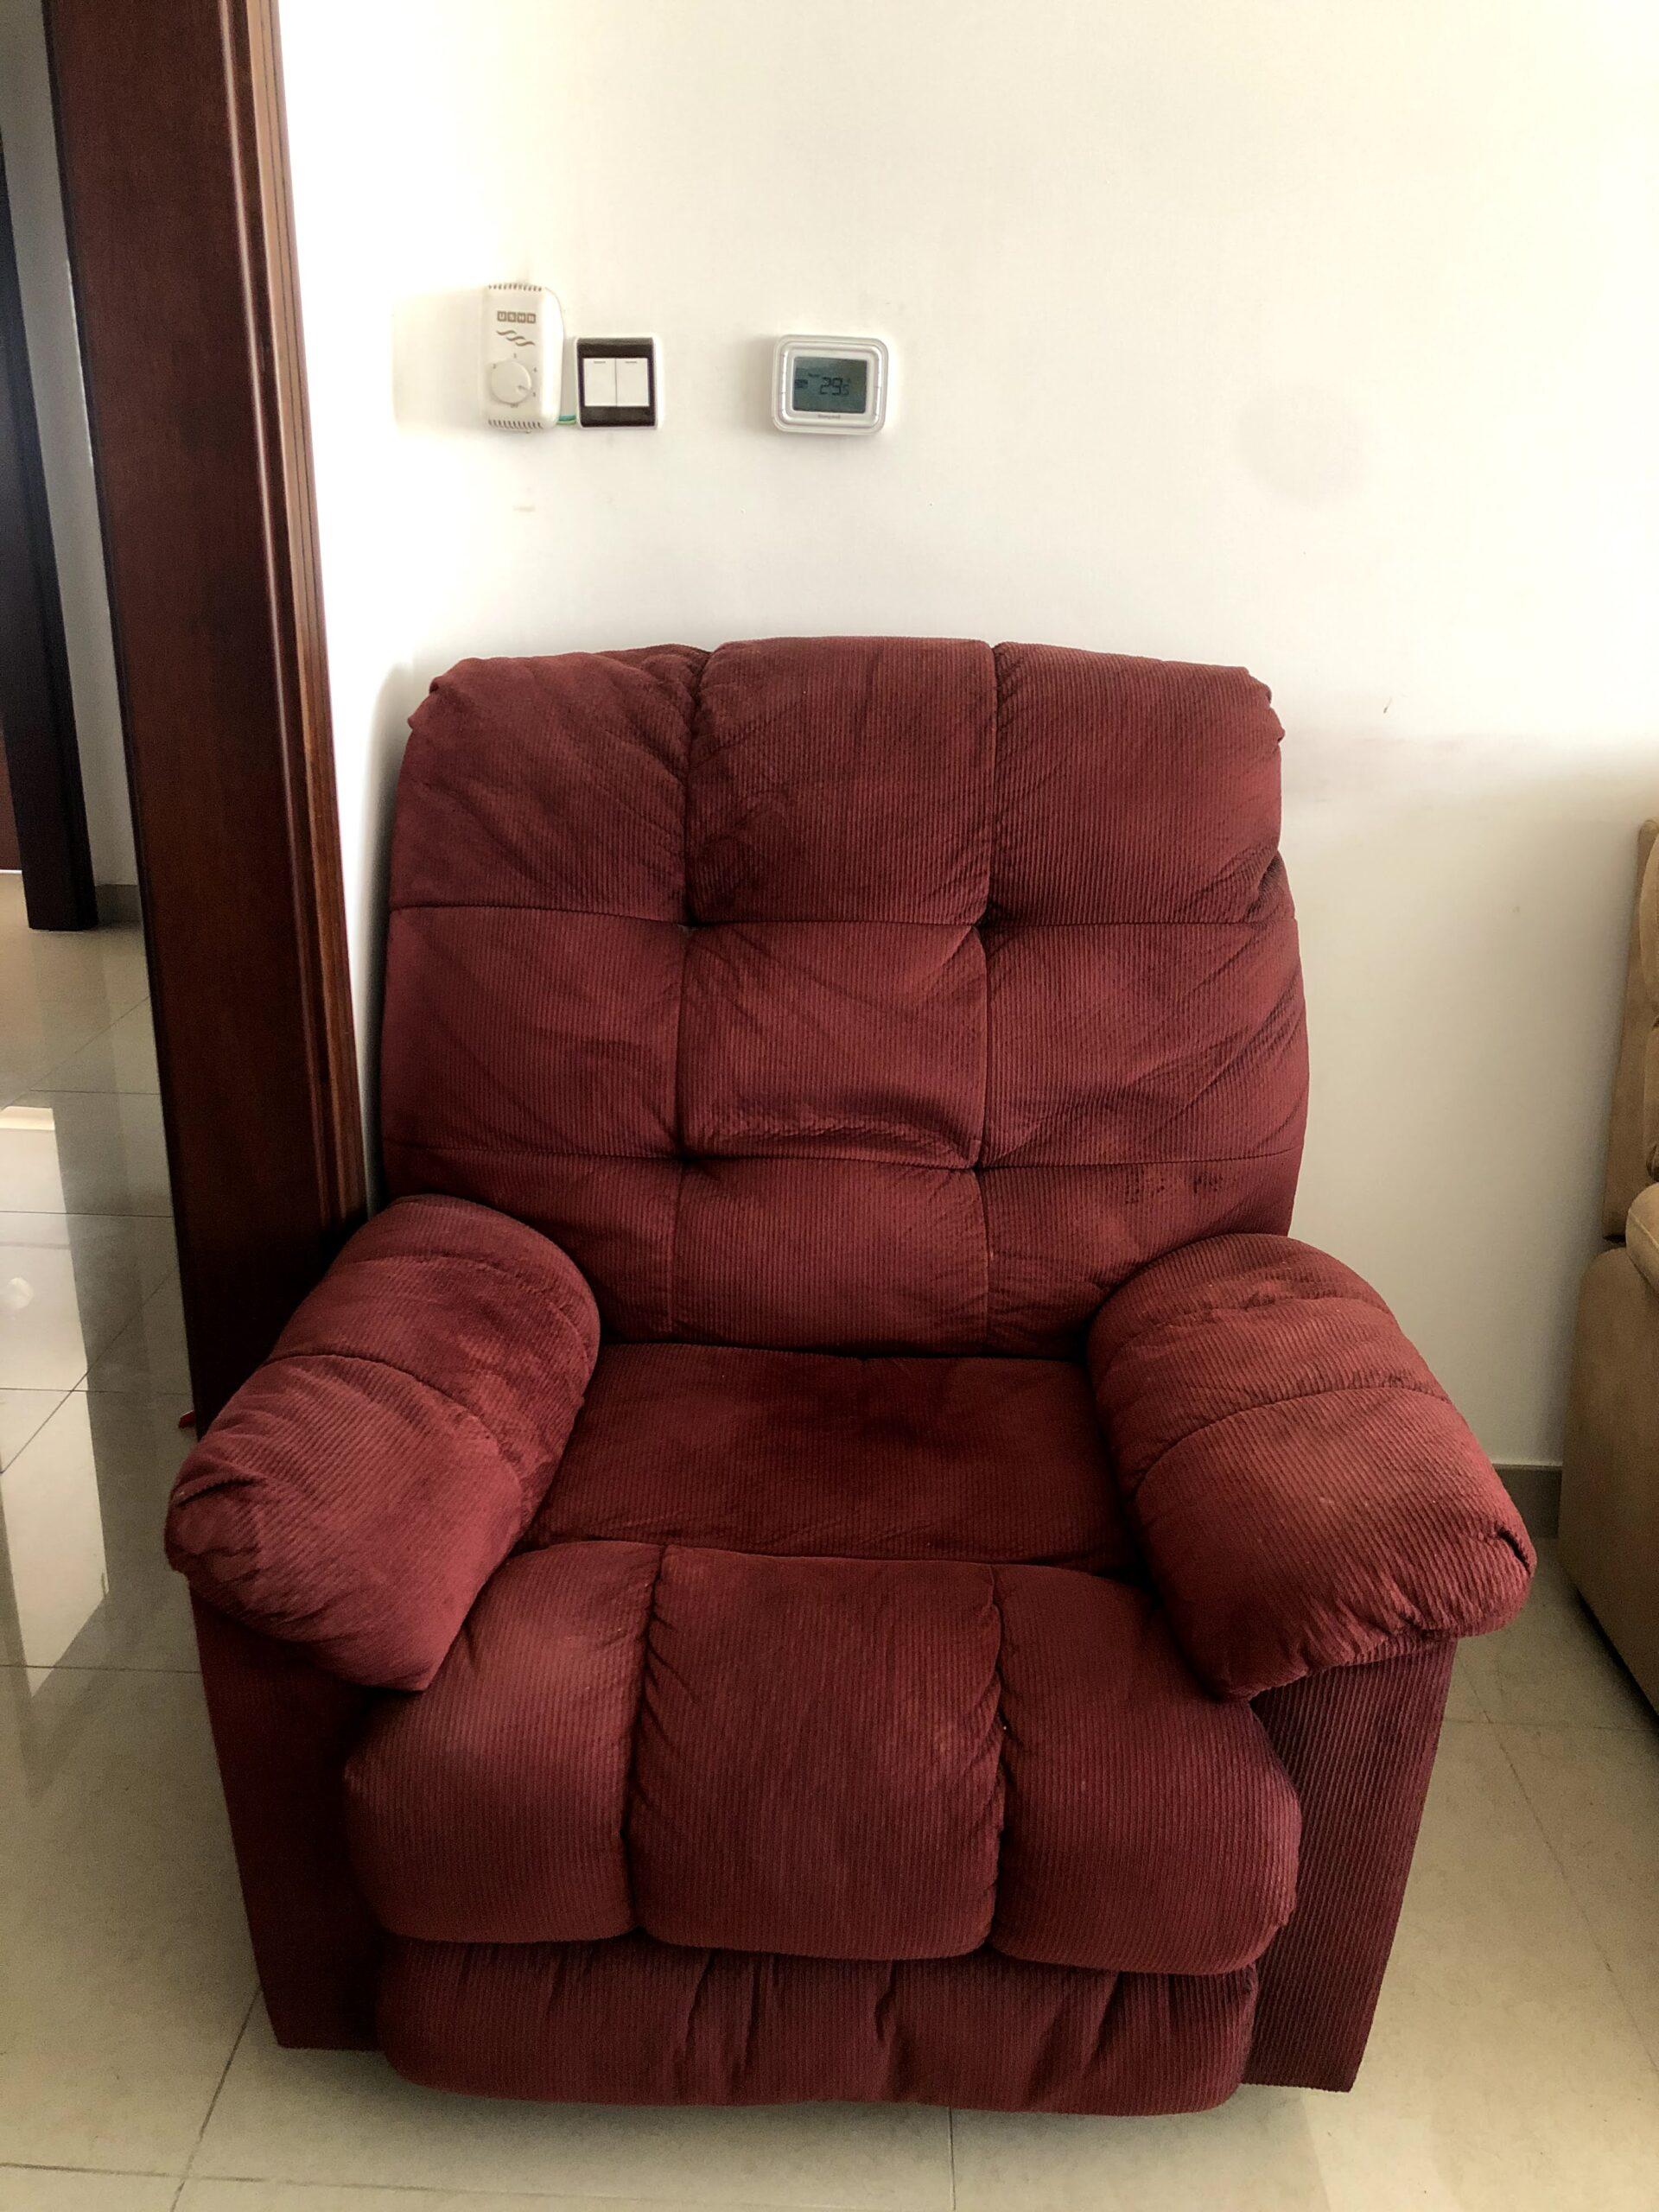 Used Sofa Sets and Tea Table for Sale in Dubai - Image 1